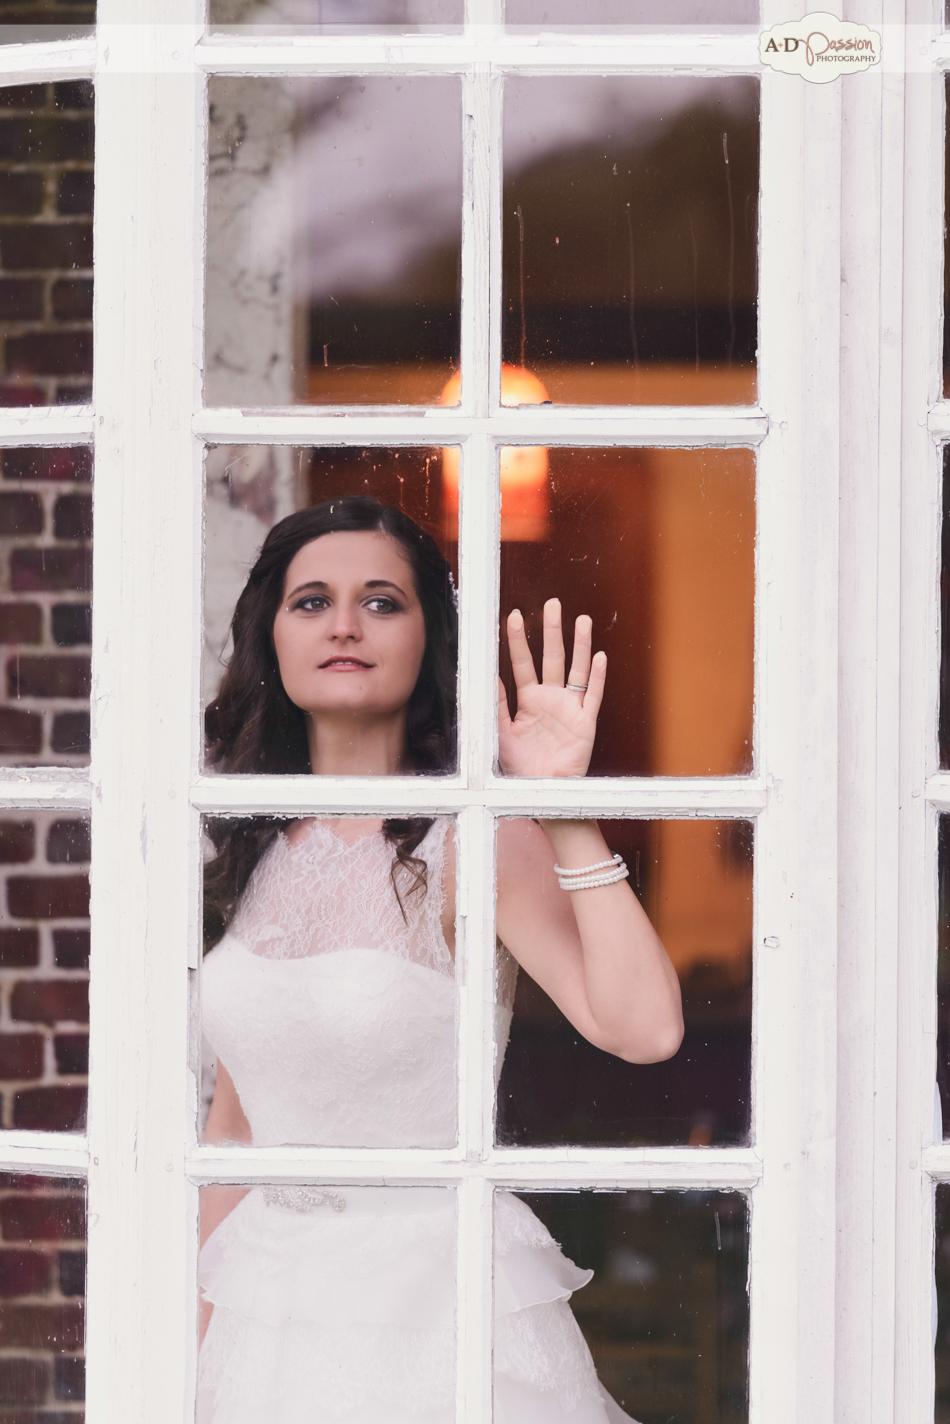 AD Passion Photography   ben-denisa-after-wedding-normandie_fotograf-nunta-ad-passion_0006   Adelin, Dida, fotograf profesionist, fotograf de nunta, fotografie de nunta, fotograf Timisoara, fotograf Craiova, fotograf Bucuresti, fotograf Arad, nunta Timisoara, nunta Arad, nunta Bucuresti, nunta Craiova